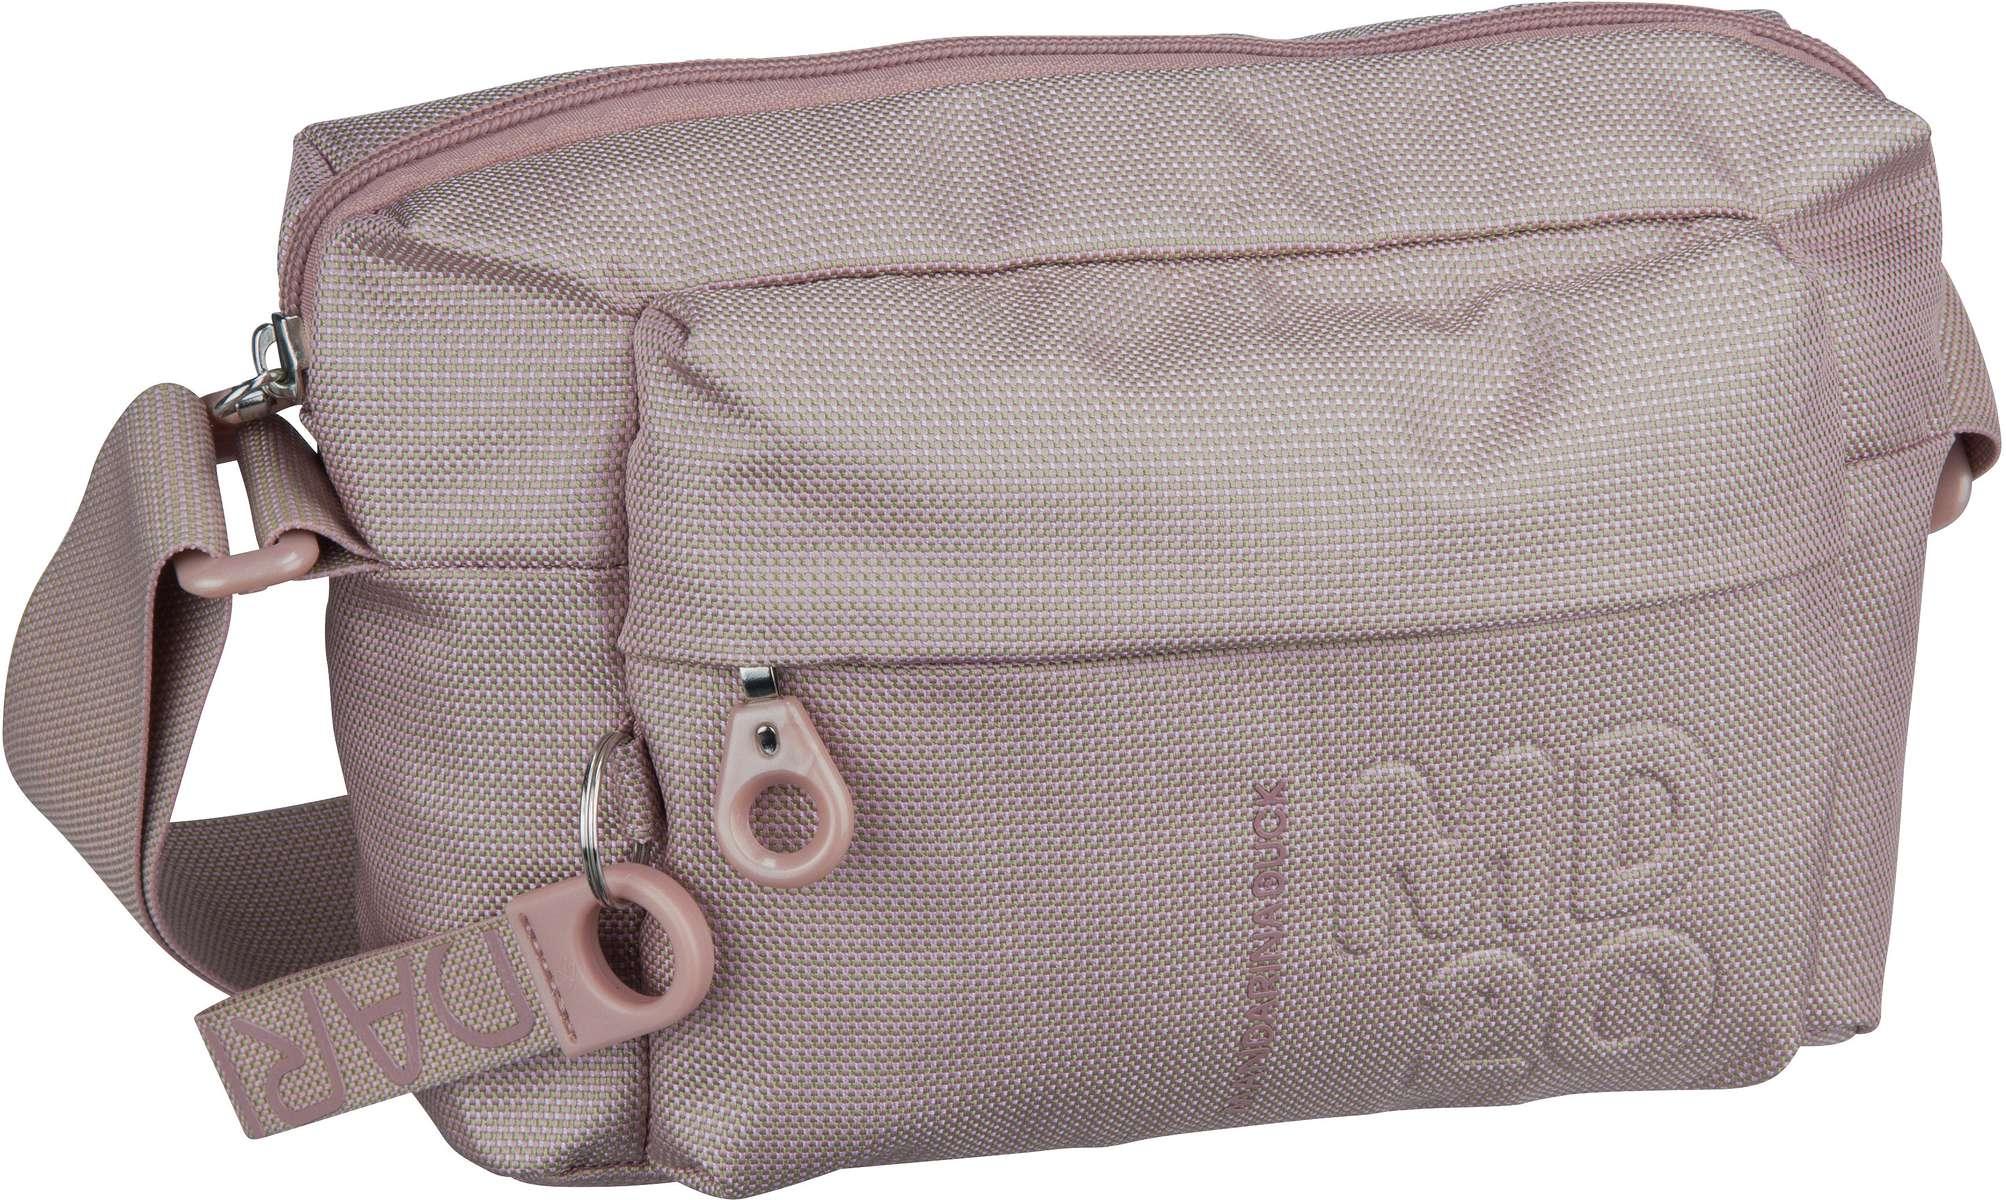 Umhängetasche MD20 Small Crossover Bag QMTT7 Pale Blush